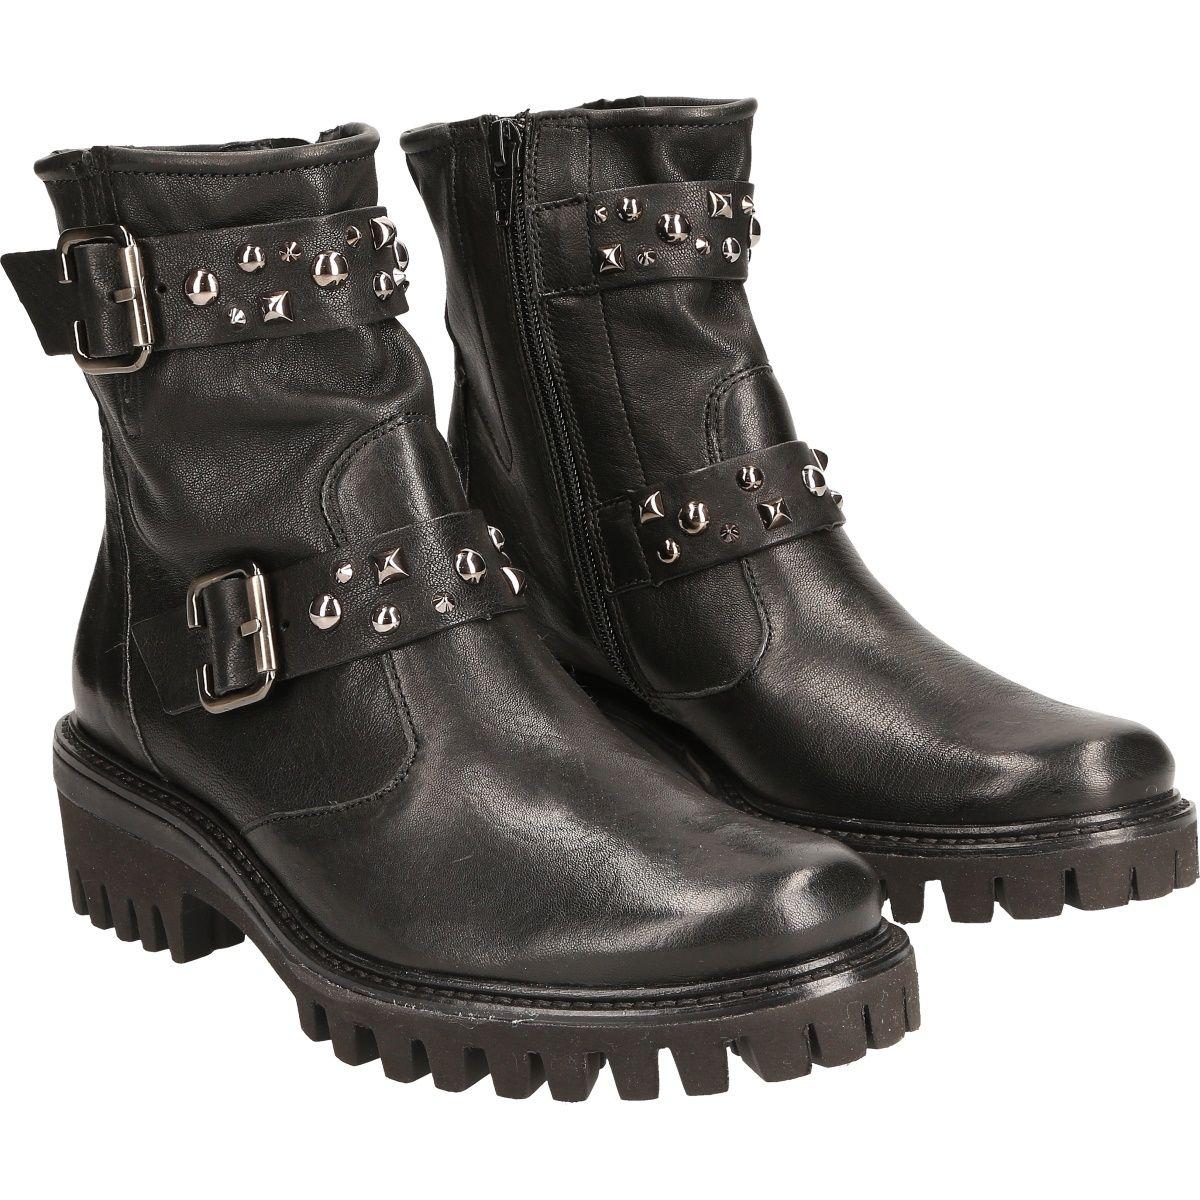 Damenschuhe Paul Green Sneaker grau (37,38,39,41,42